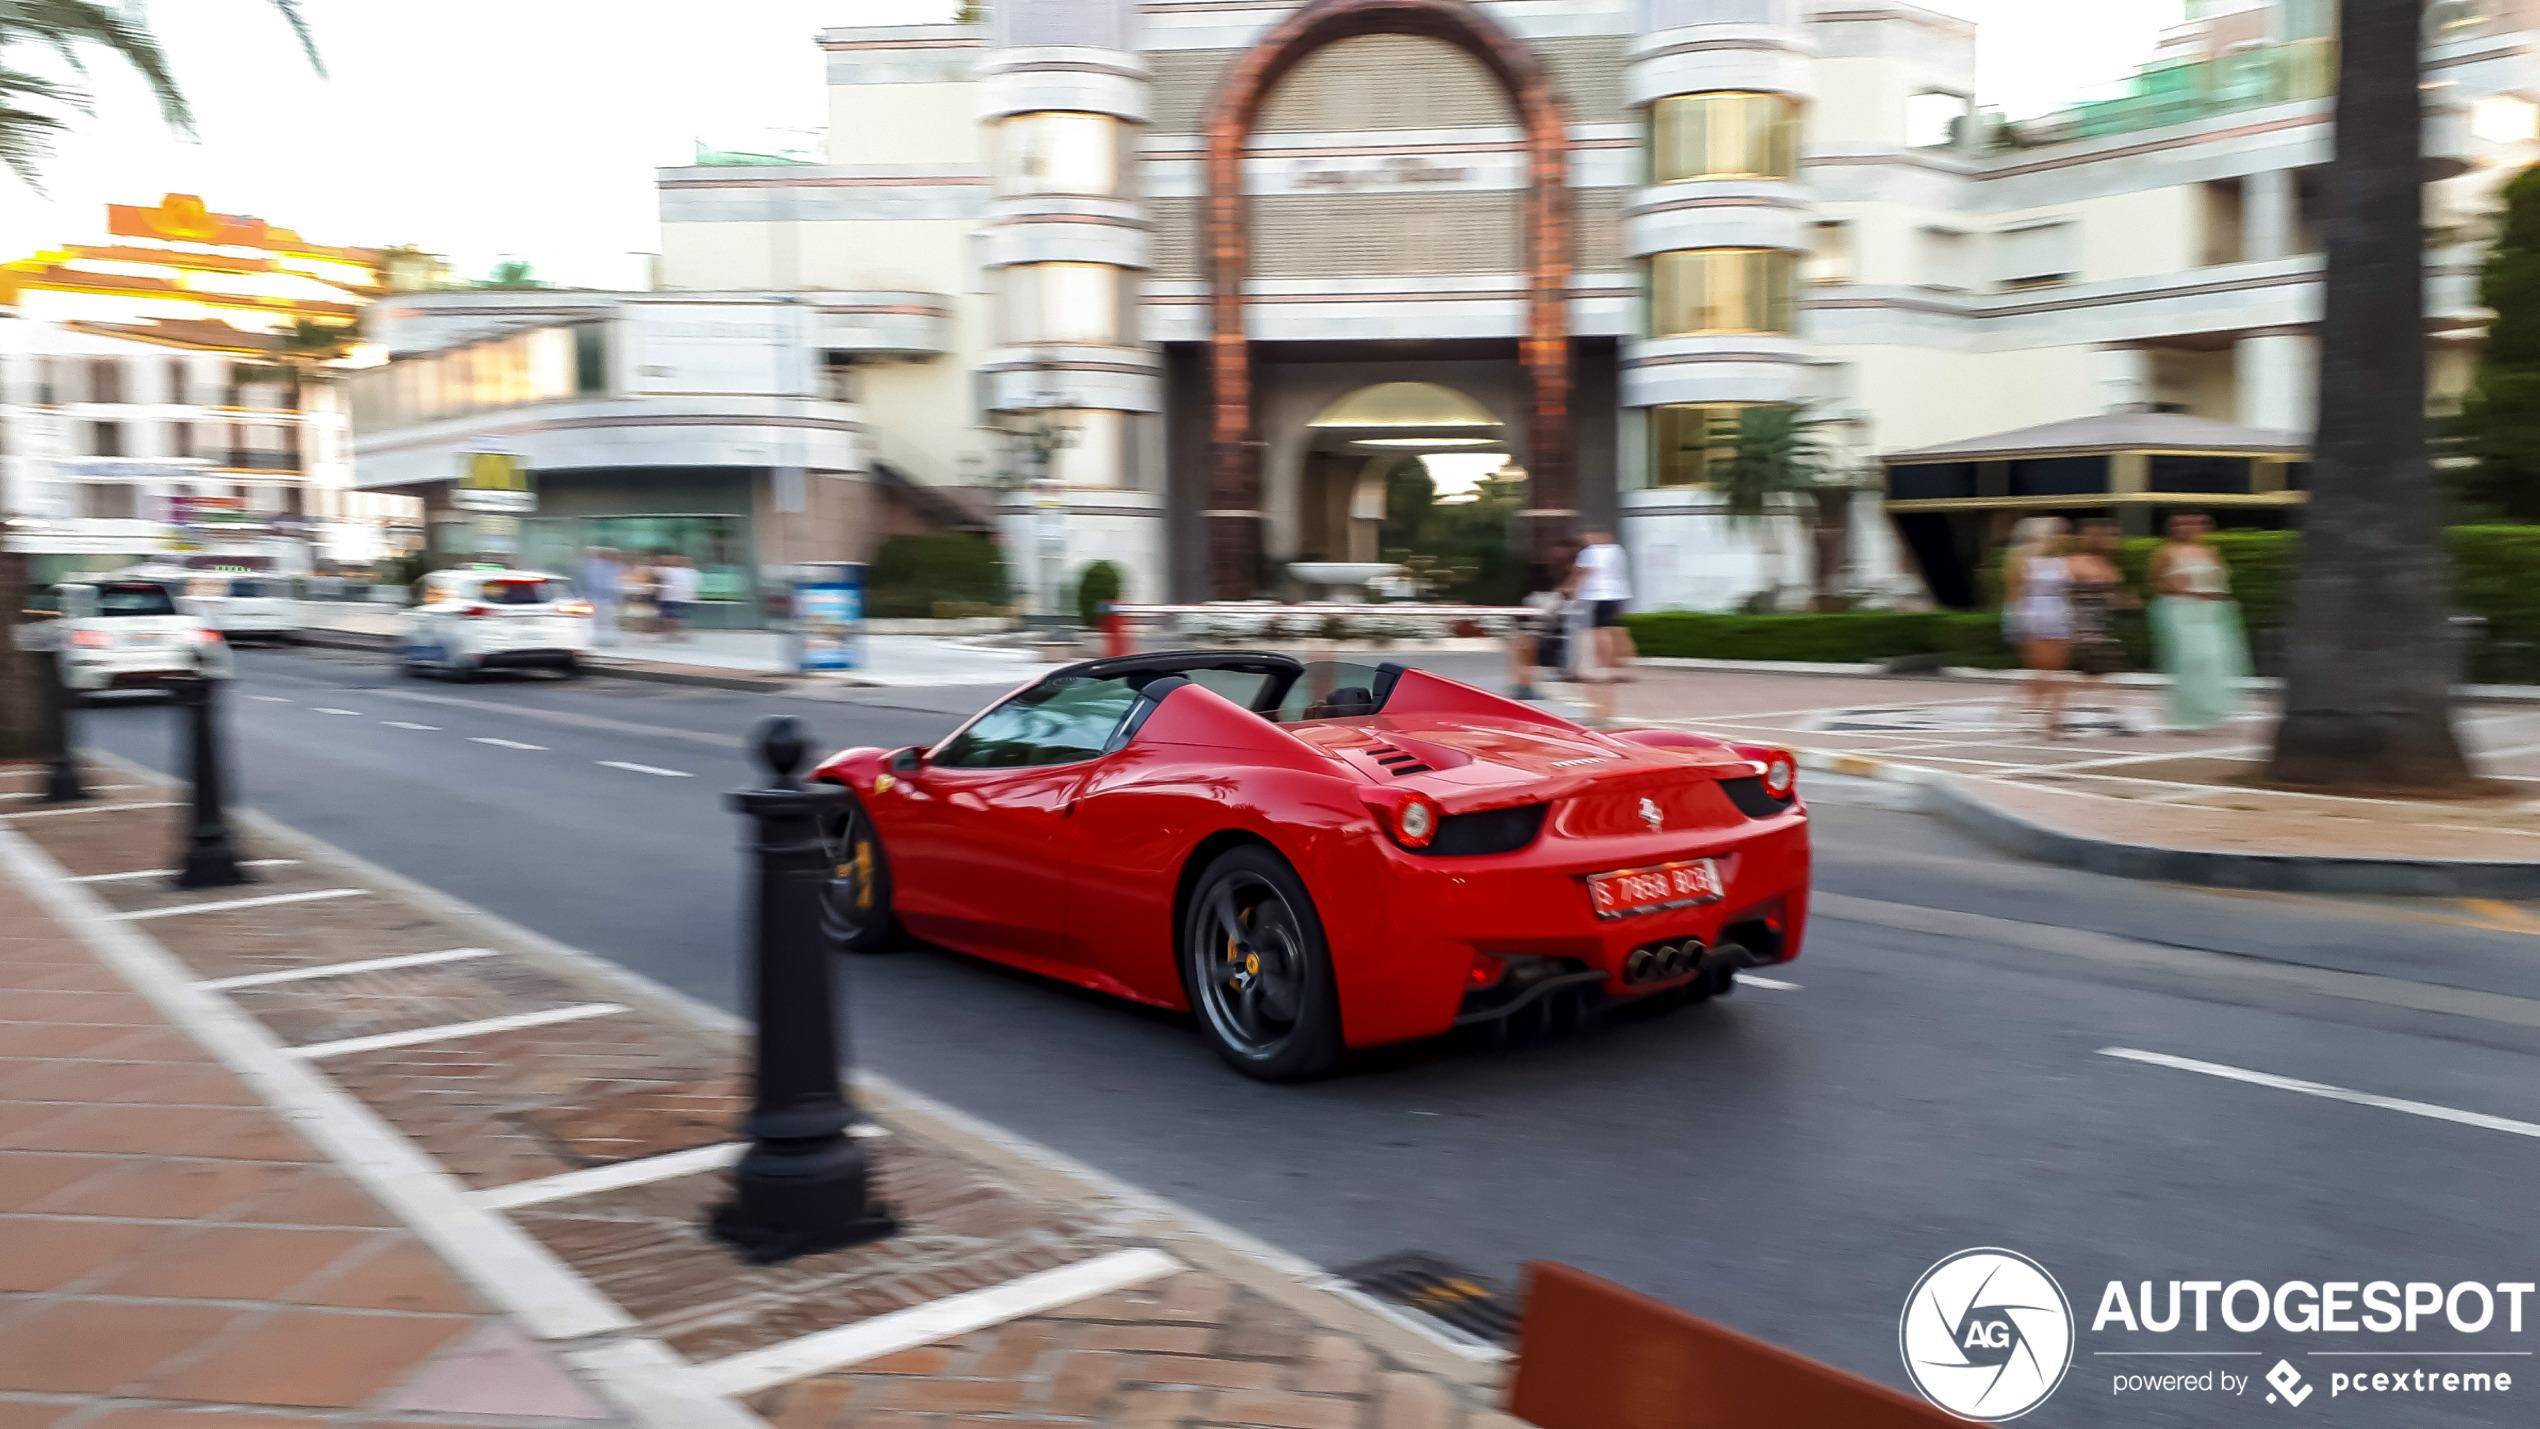 Ferrari 458 Spider - 15 January 2020 - Autogespot